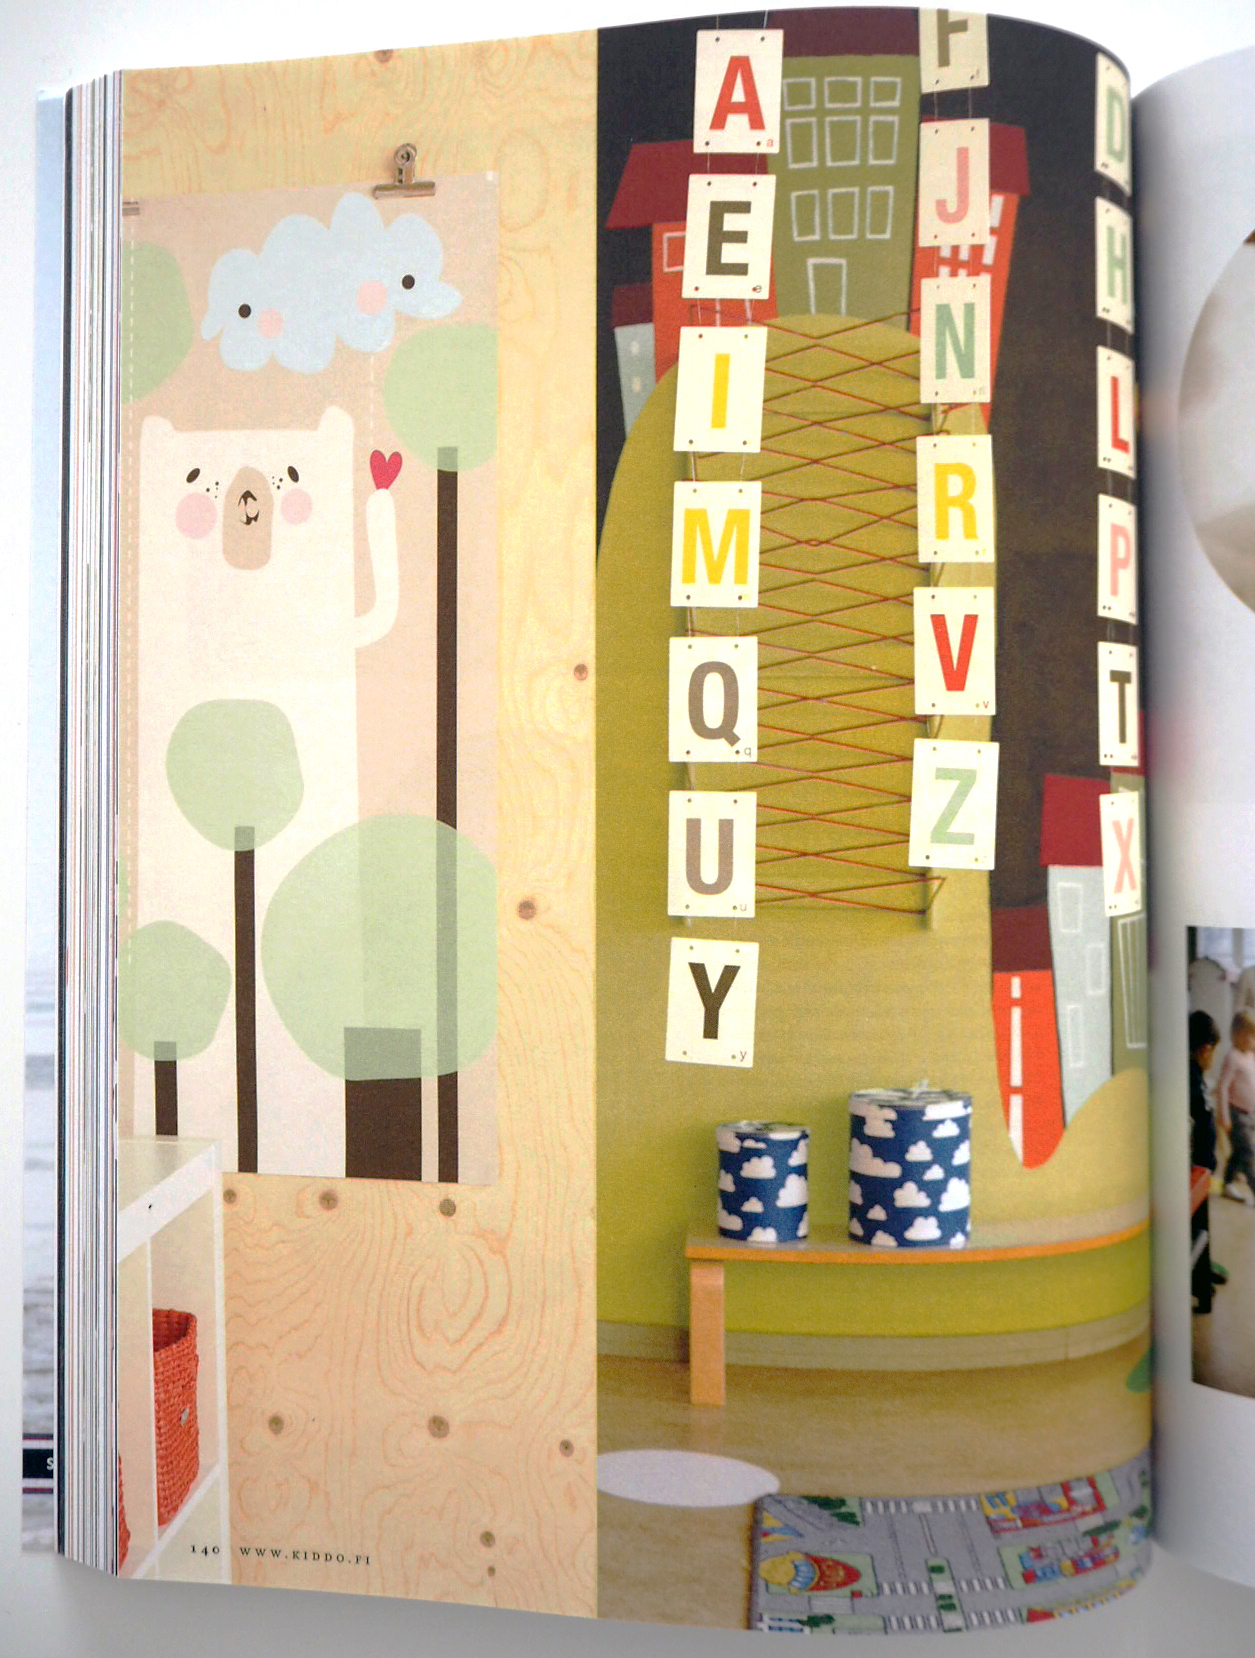 KIDD.O Magazine, 02 / 2014 MOMOLU illustrations & Piko poster (60 x 180 cm)